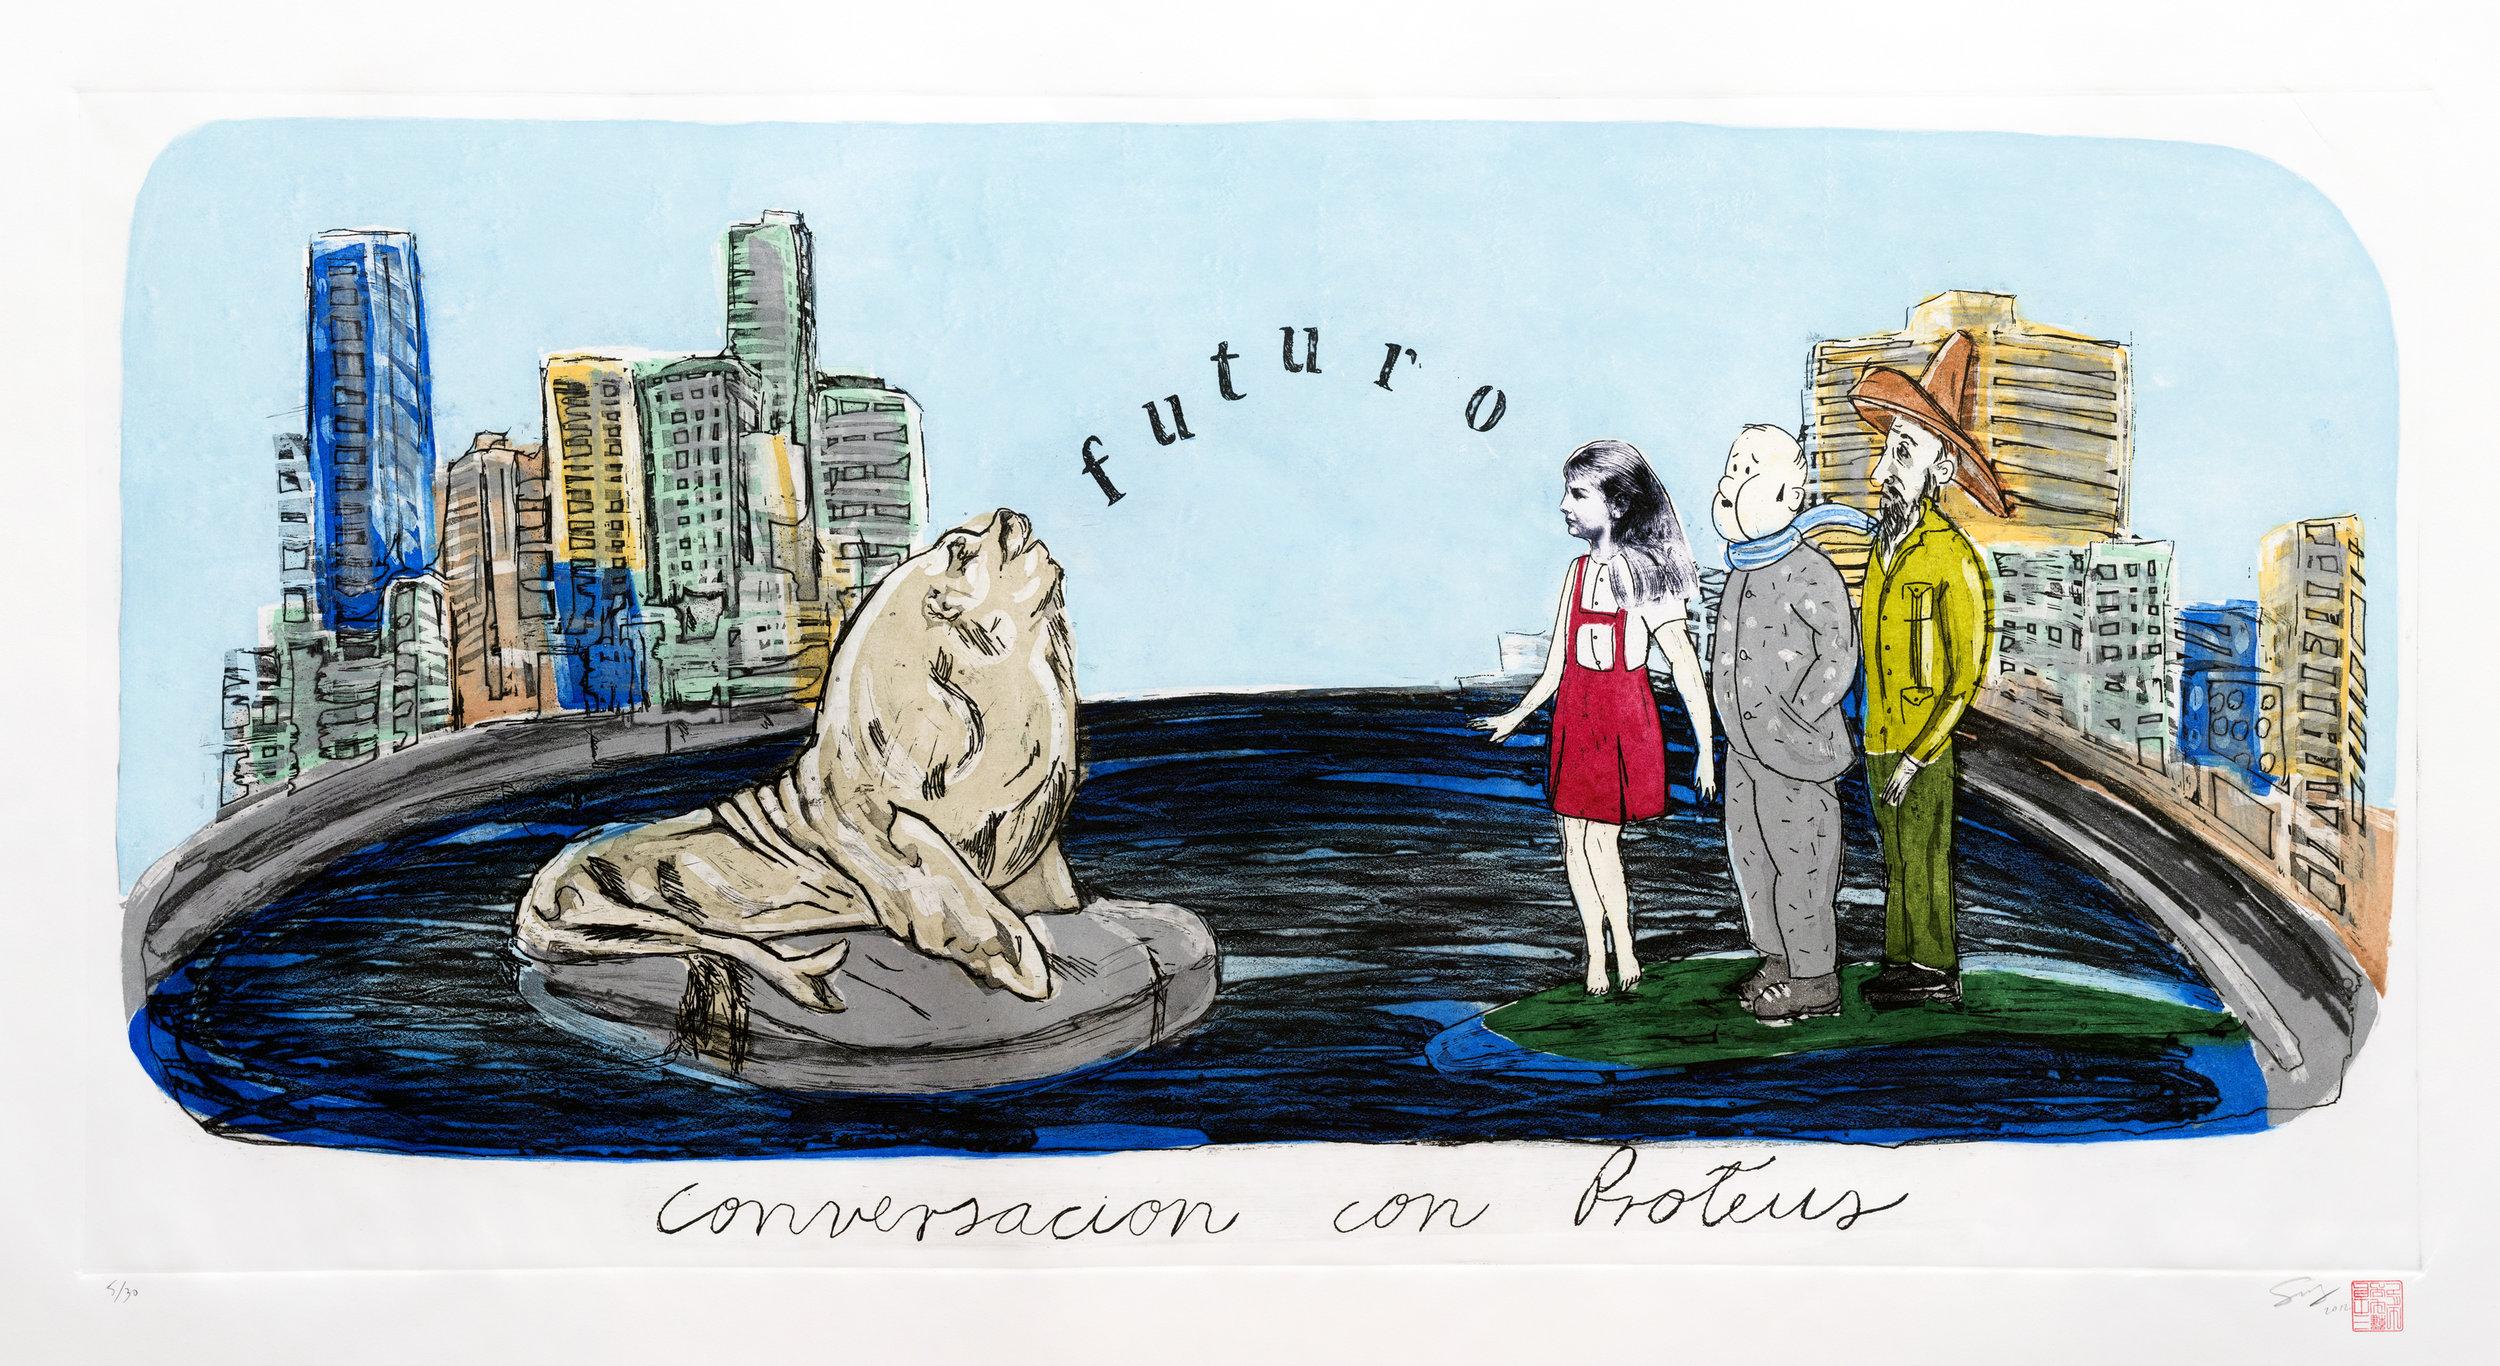 2012.Sandra Ramos. Conversacion con Proteus. etching 50 x 100 cm.jpeg